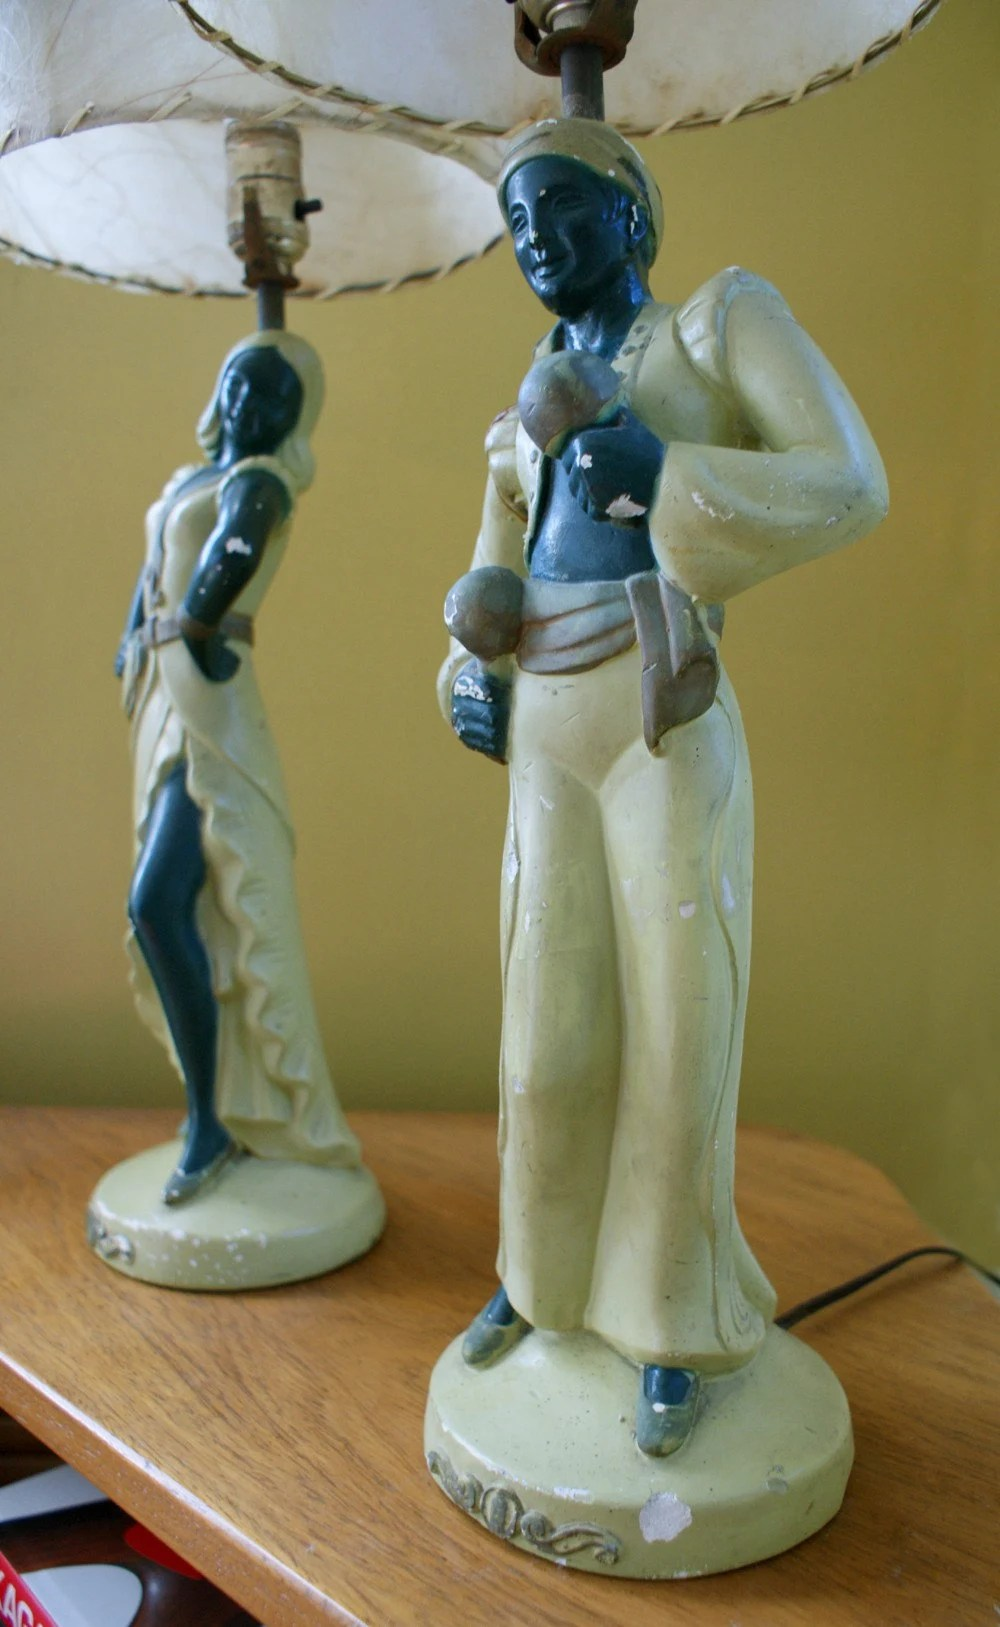 Vintage 1940s 1950s Chalkware Figural Dancer Pair of Lamps